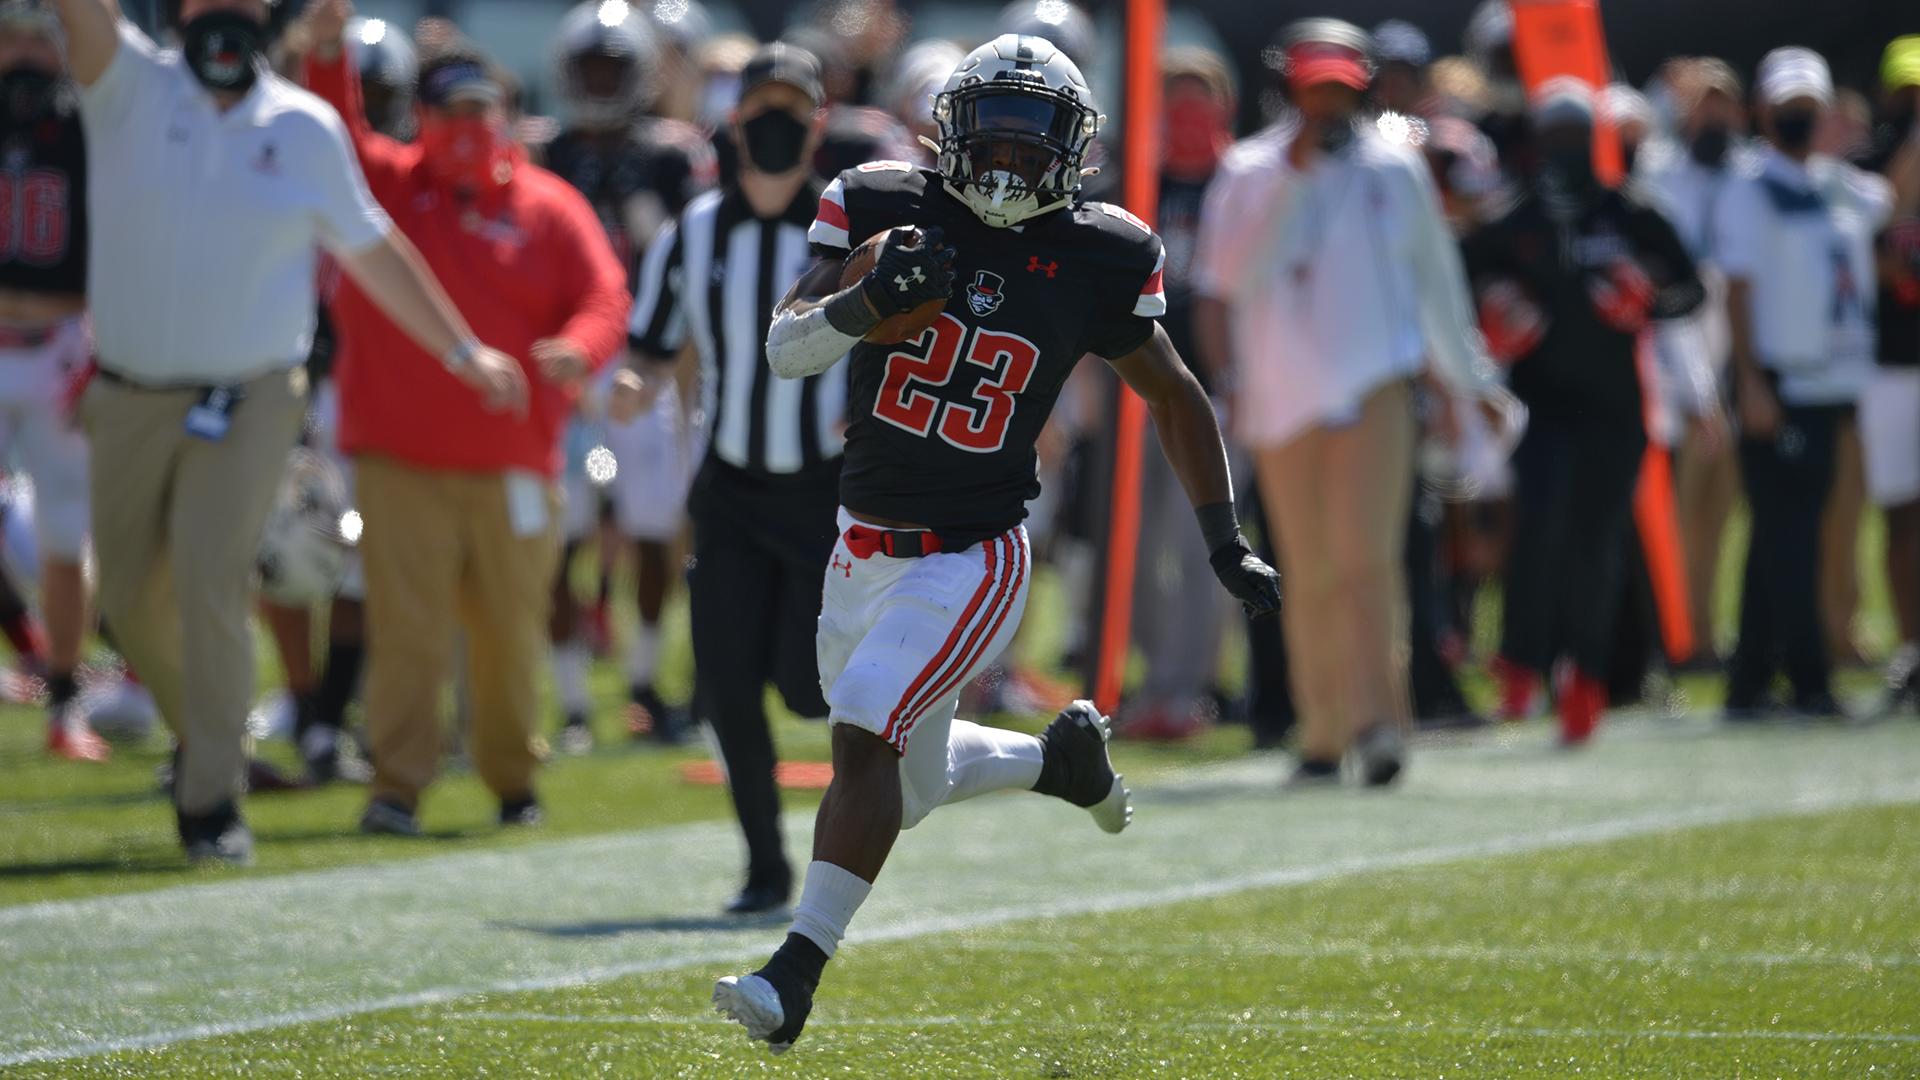 C.J. Evans runs down the sideline for a 64-yard score against the University of Cincinnati | APSU SPORTS INFORMATION